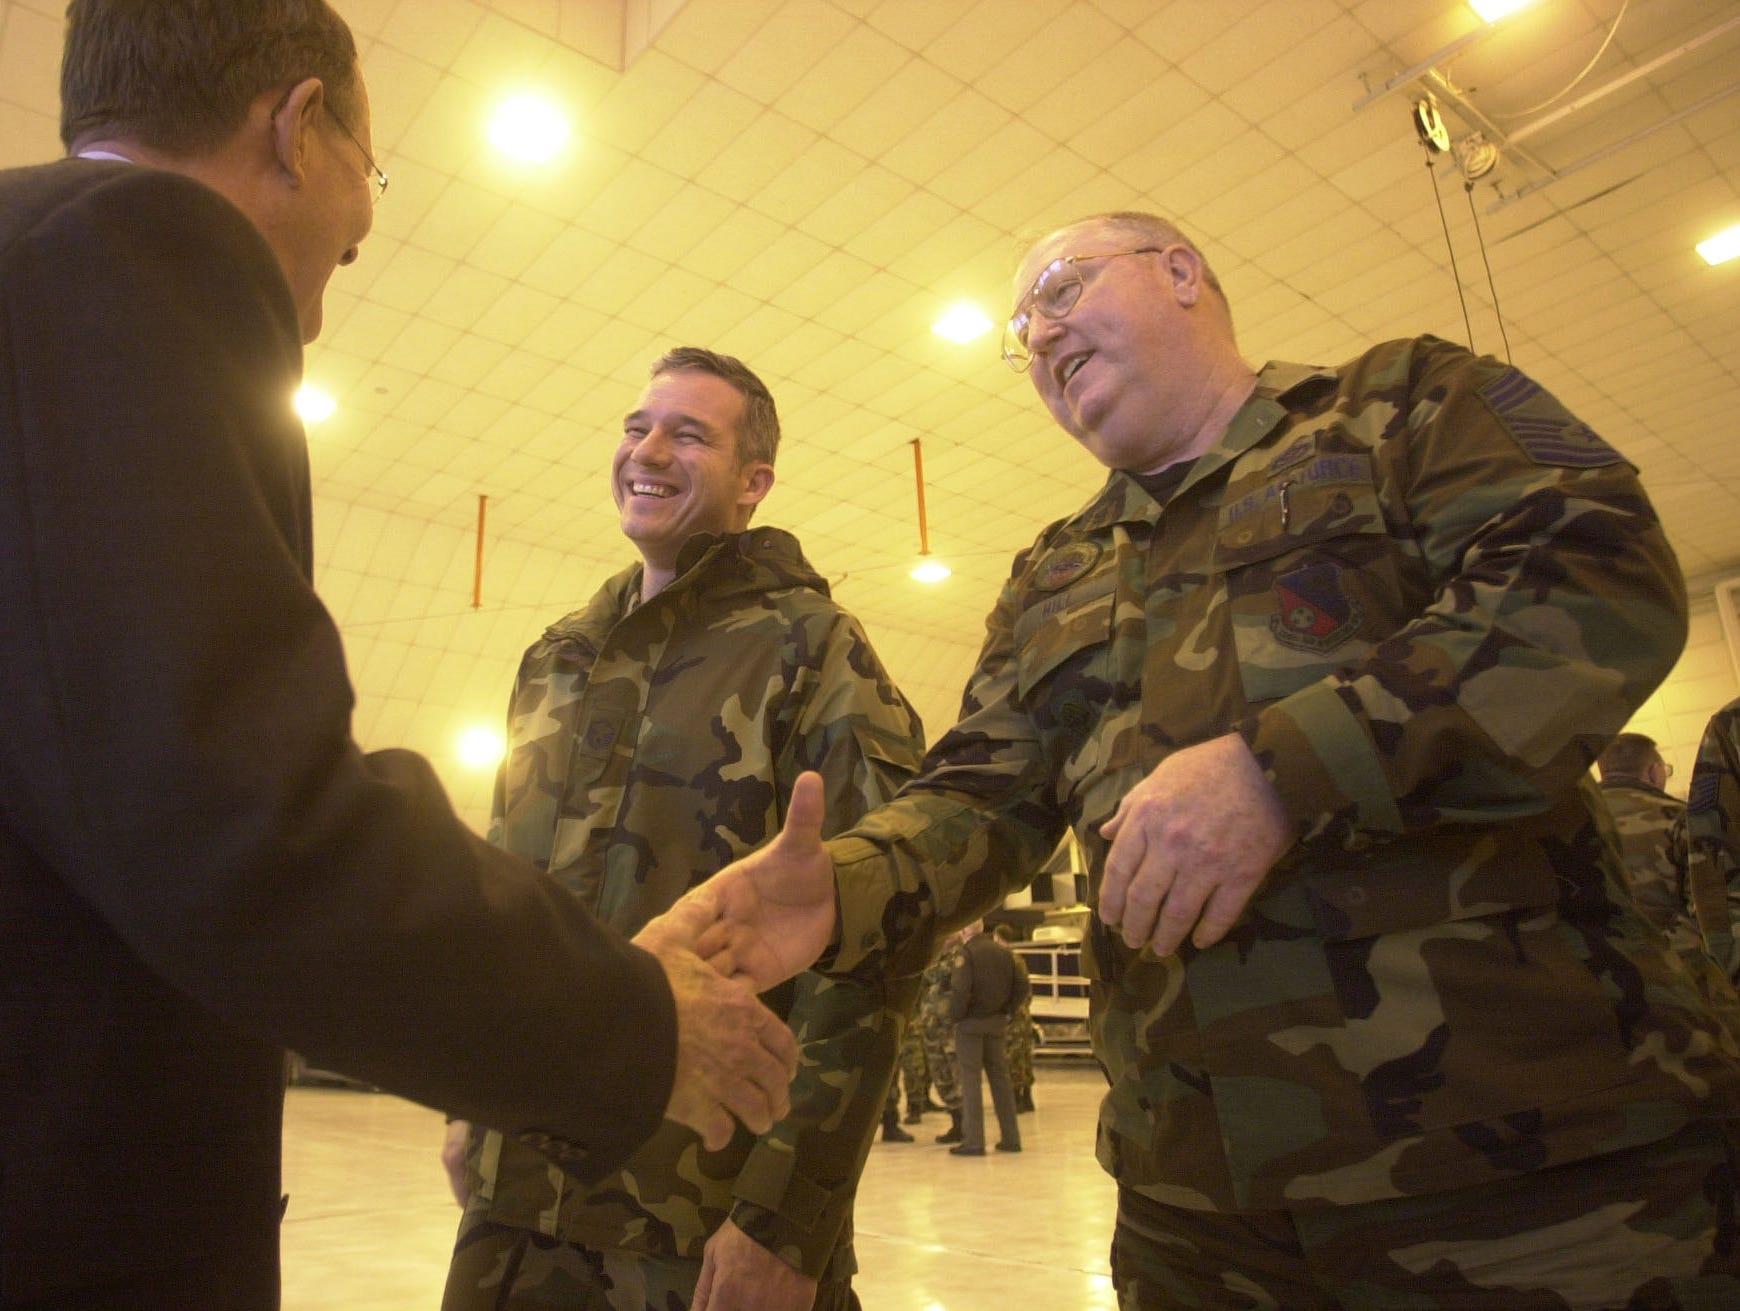 Master Sgt. Patrick LaDue, center, and Chief Master Sgt. Doug Hill greet Senator Lamar Alexander at the National Guard base at McGhee Tyson Airport Thursday.